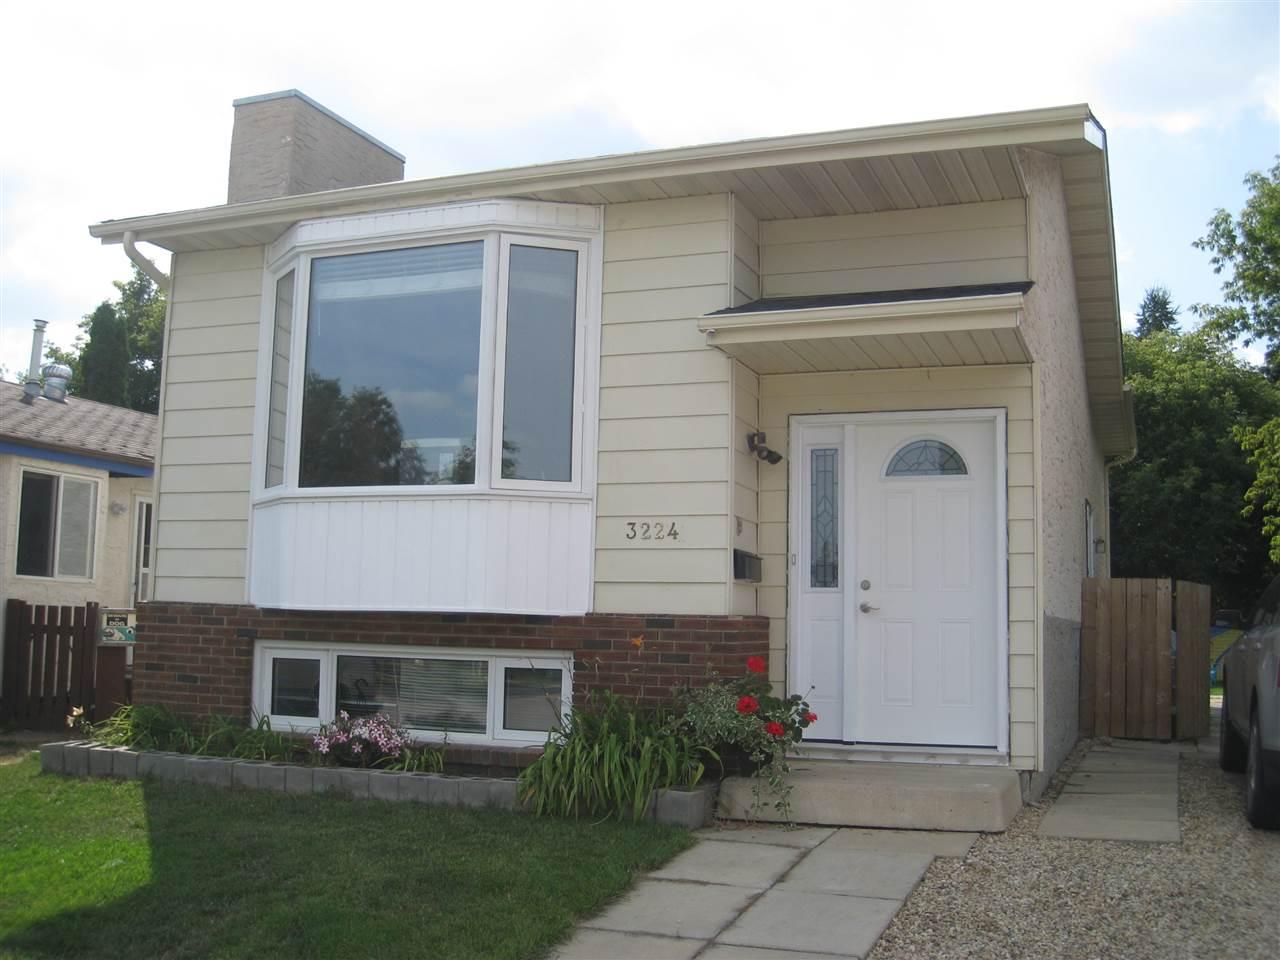 3224 45A Street, 2 bed, 1 bath, at $265,000